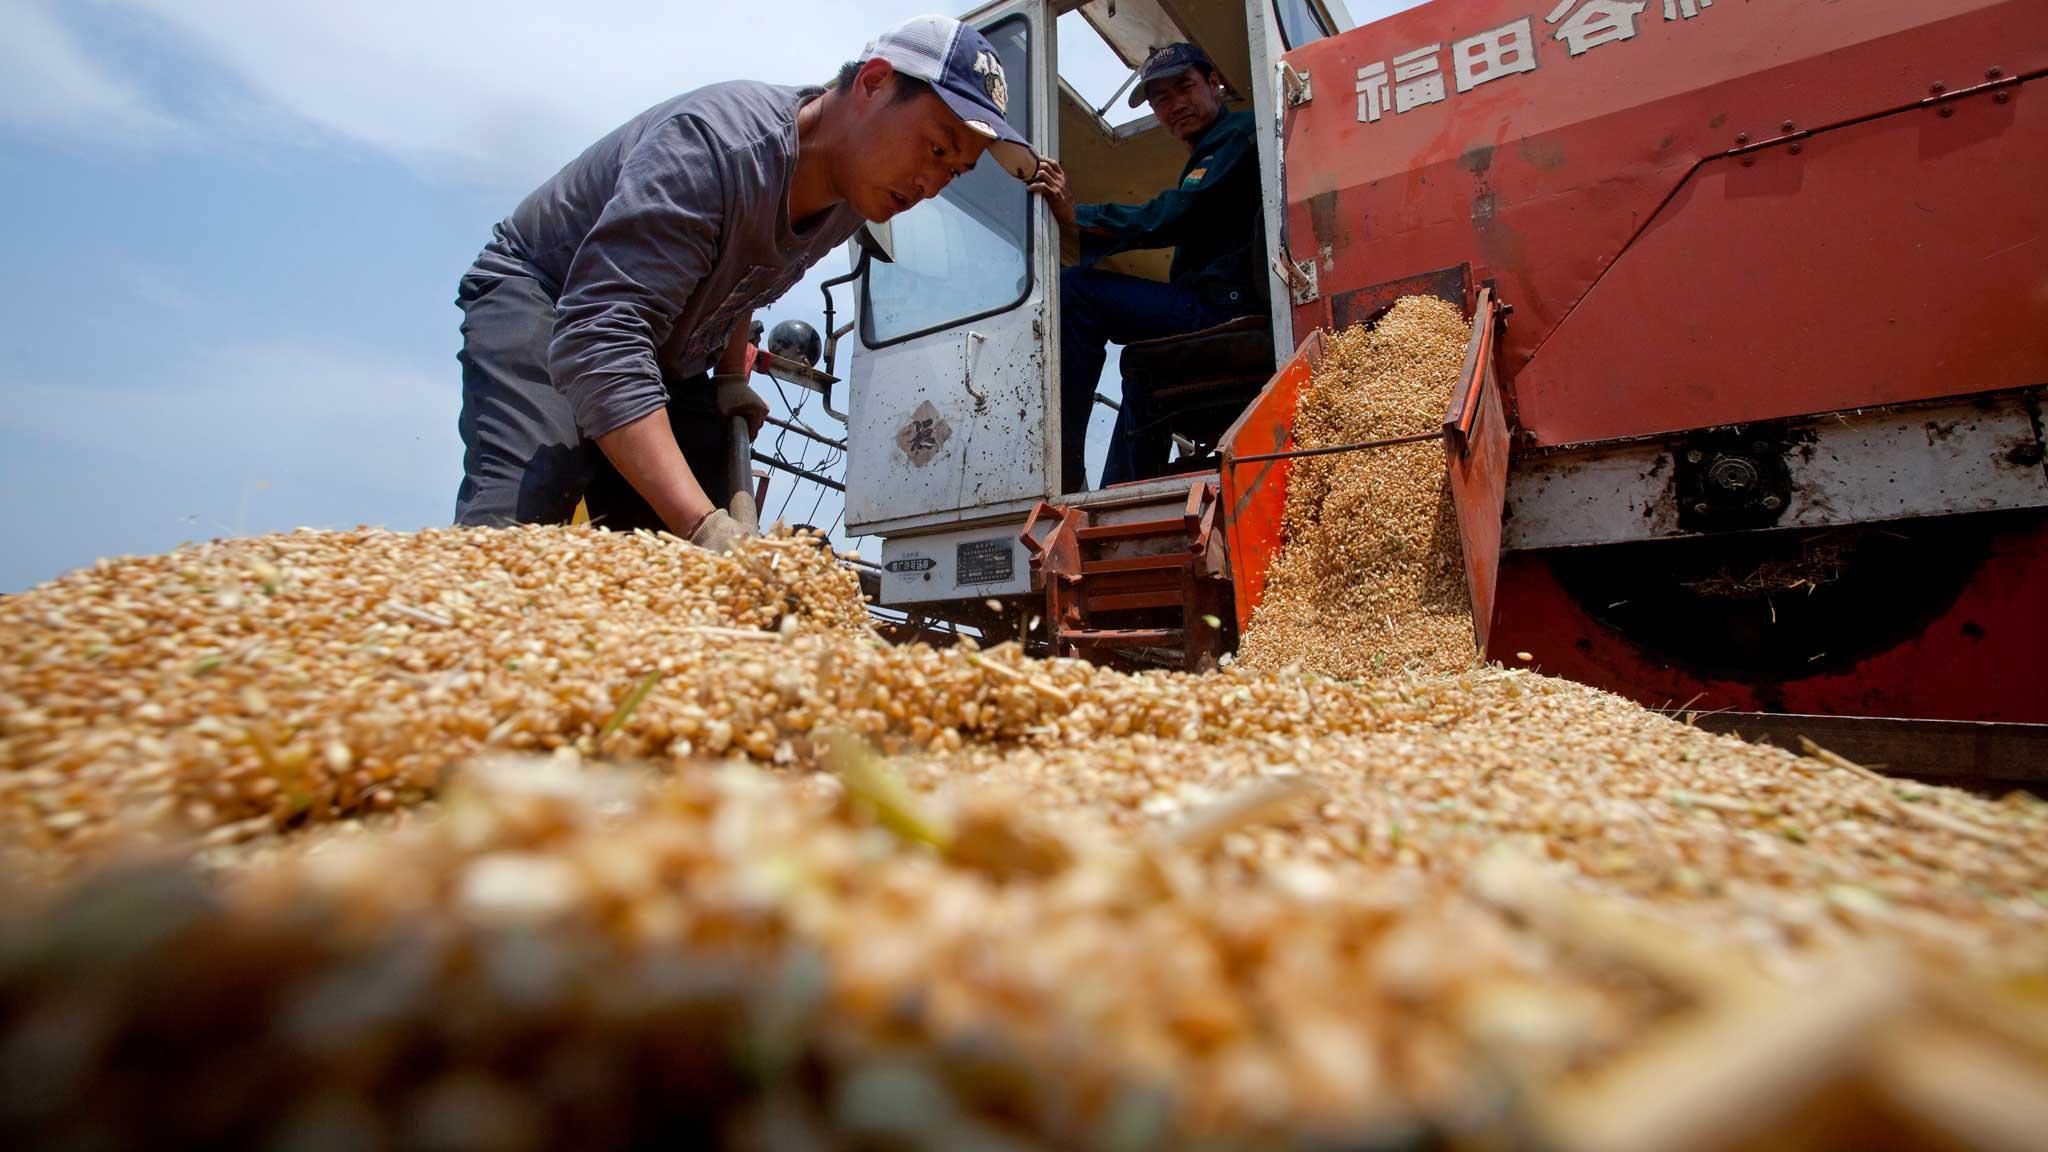 Tough agriculture market spurs trading alliances and ventures | Financial Times